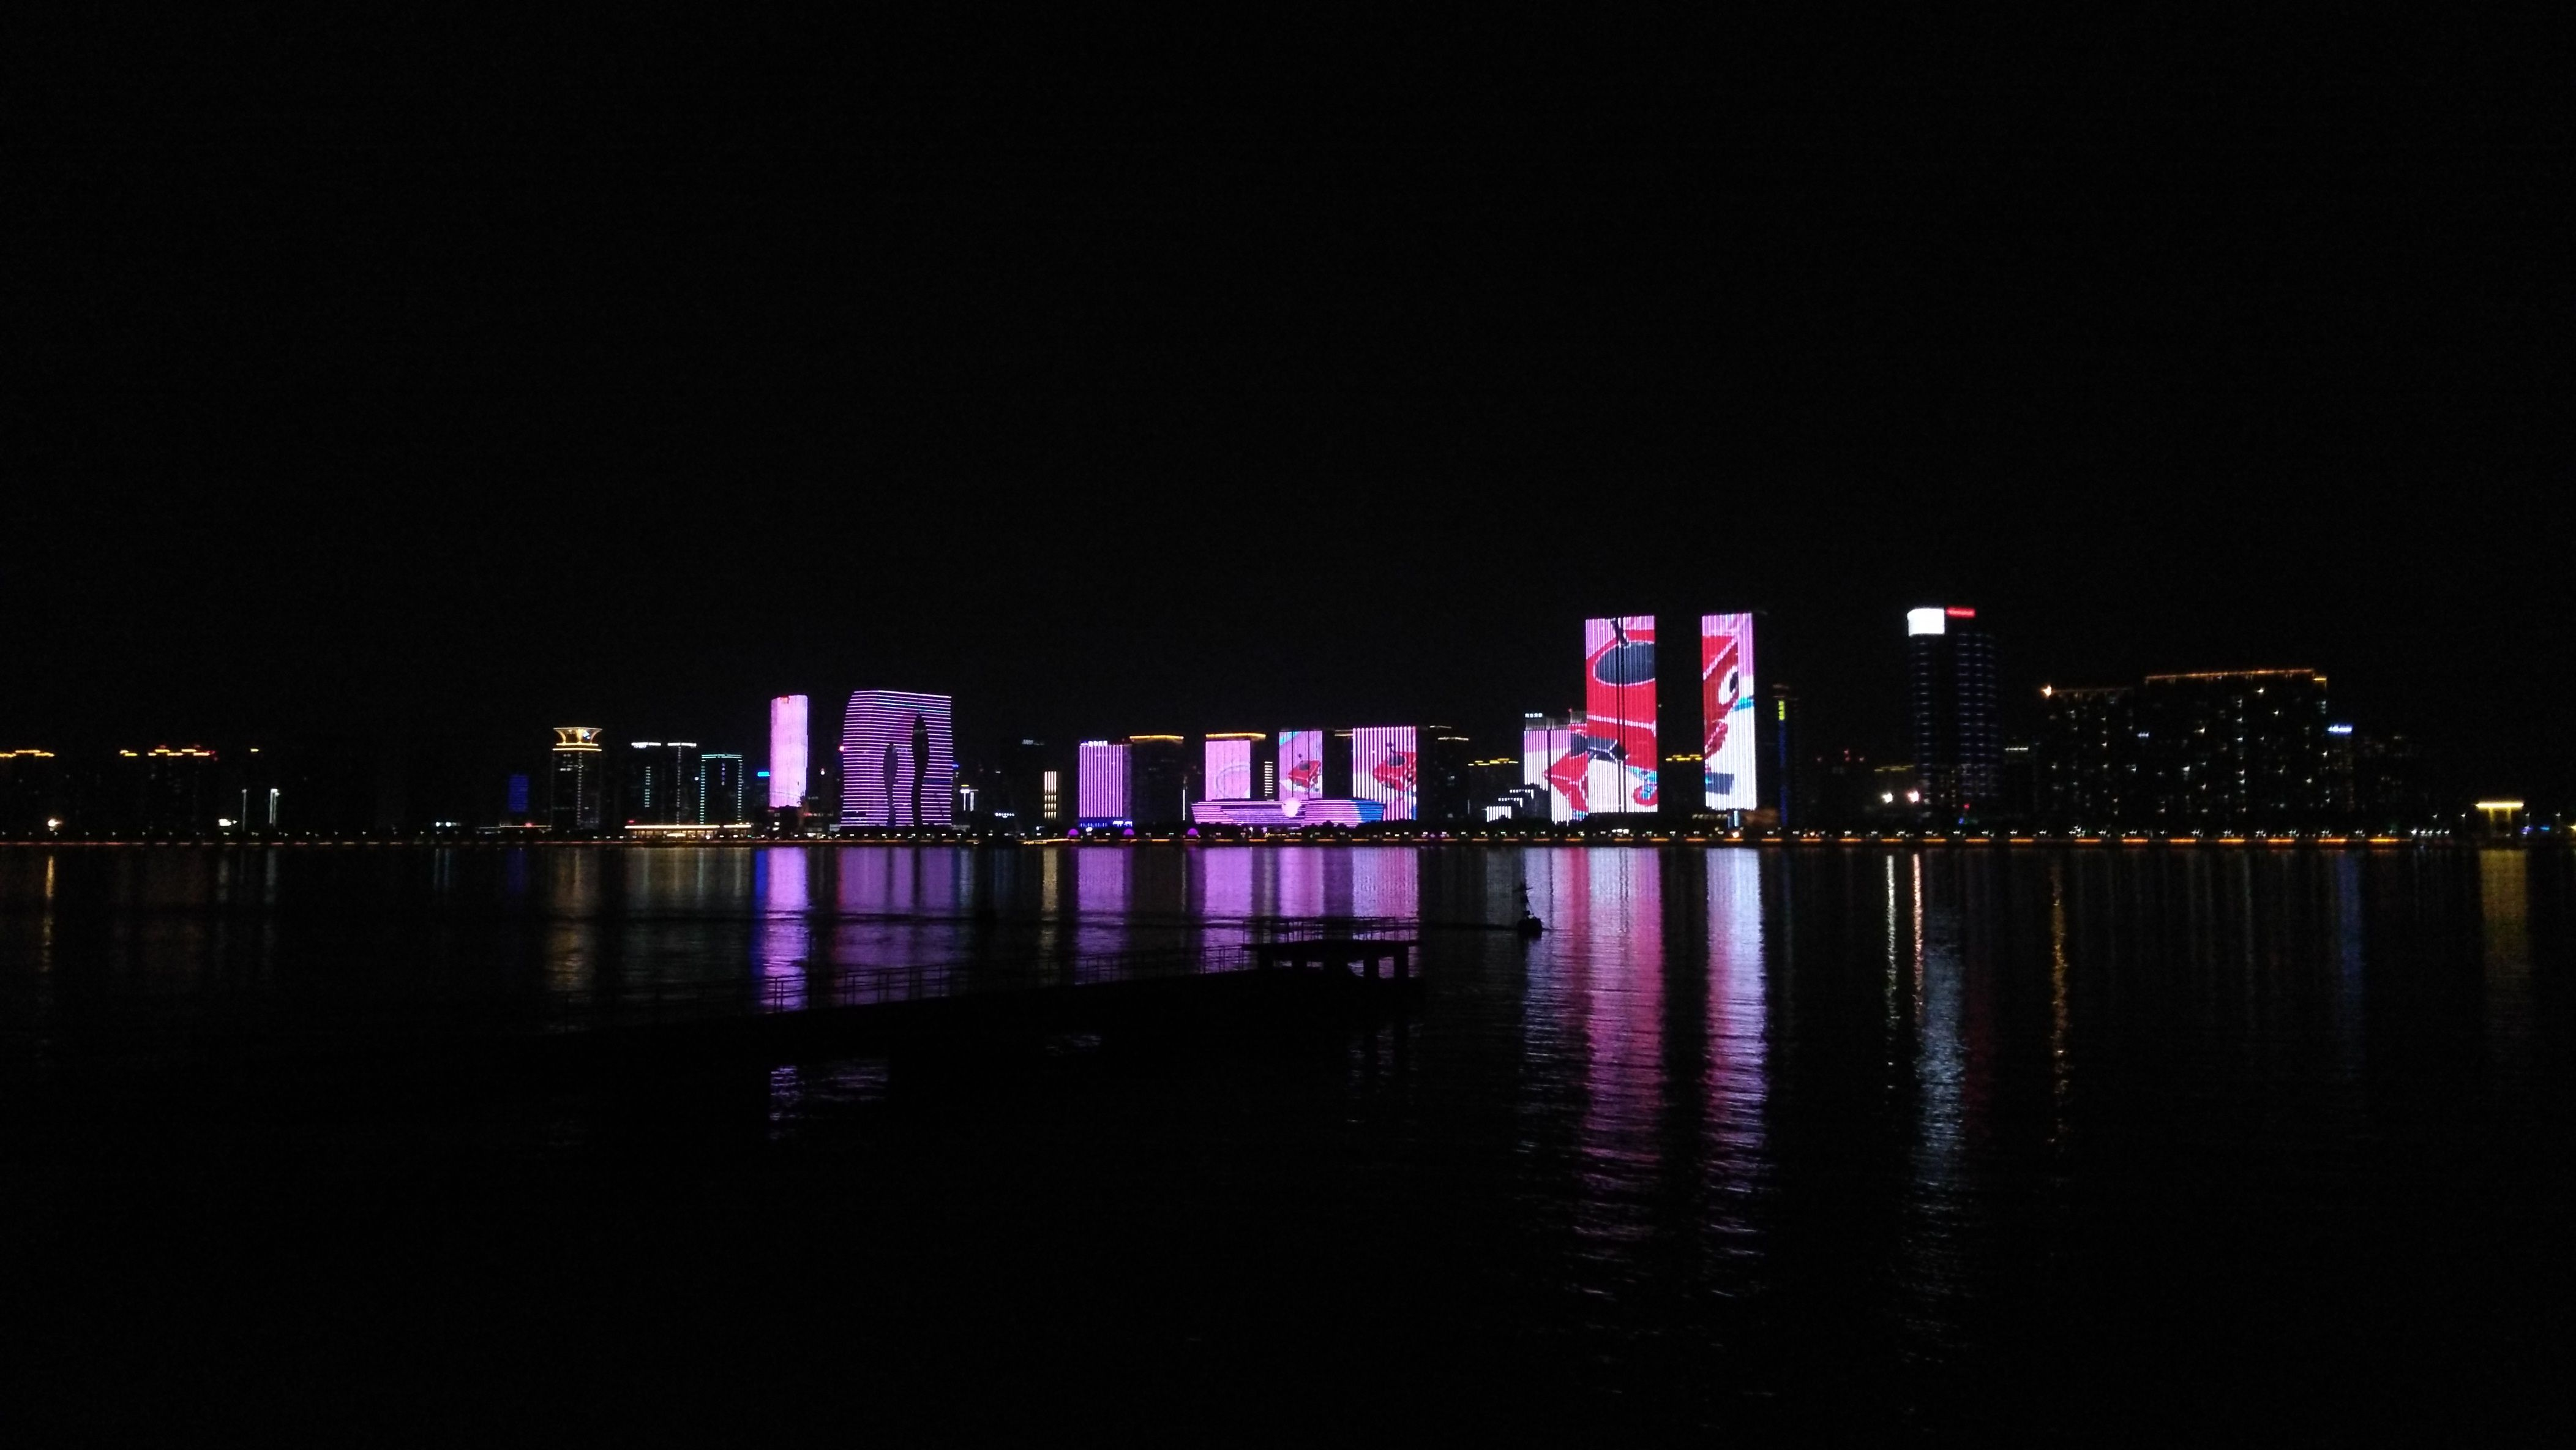 led media facade lighting & led media facade lighting | led facade lighting(led pixel light ...